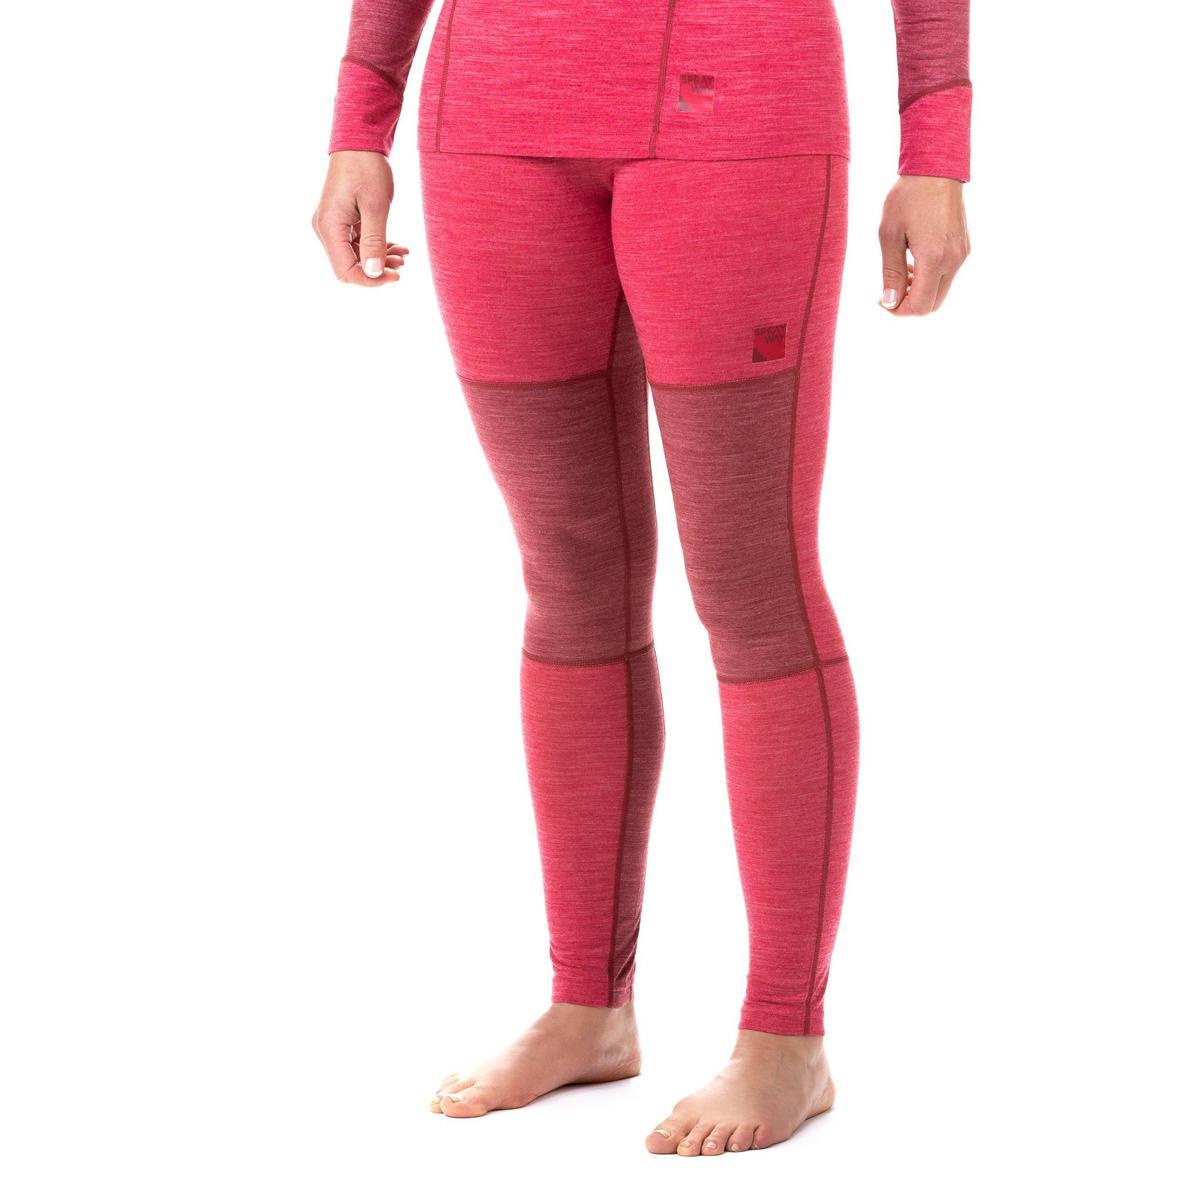 Sprayway Women's Kara Leggings - Red